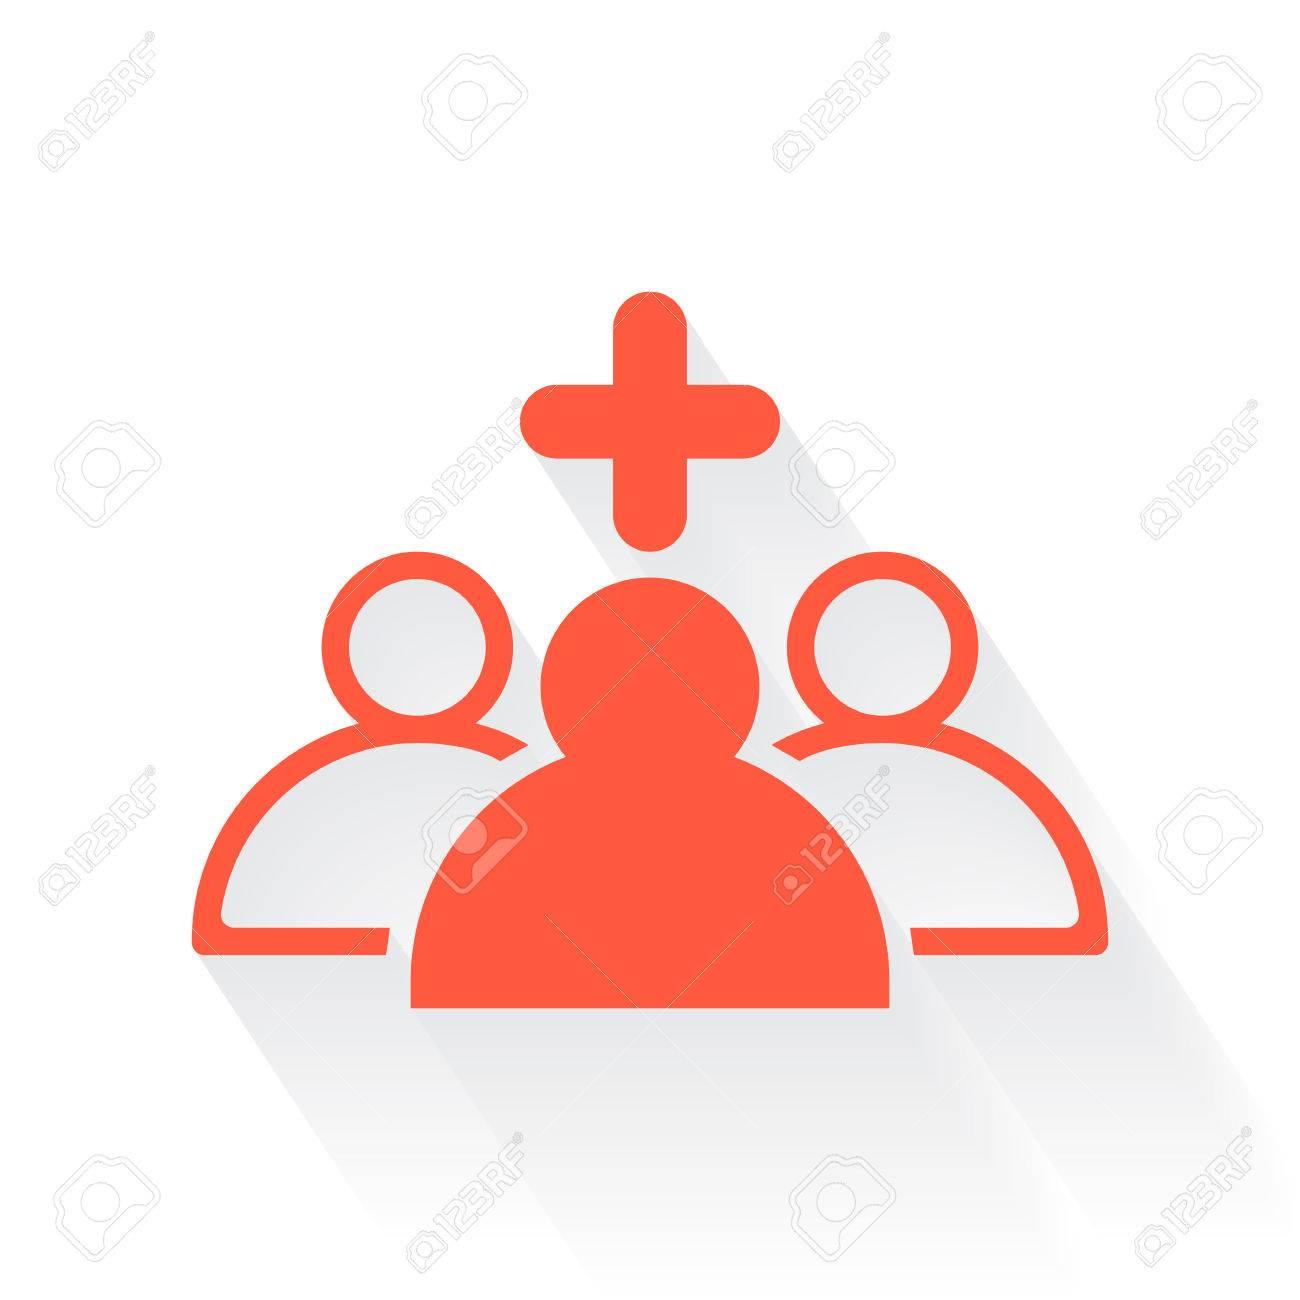 Orange Medical Staff Symbol With Drop Shadow On White Background